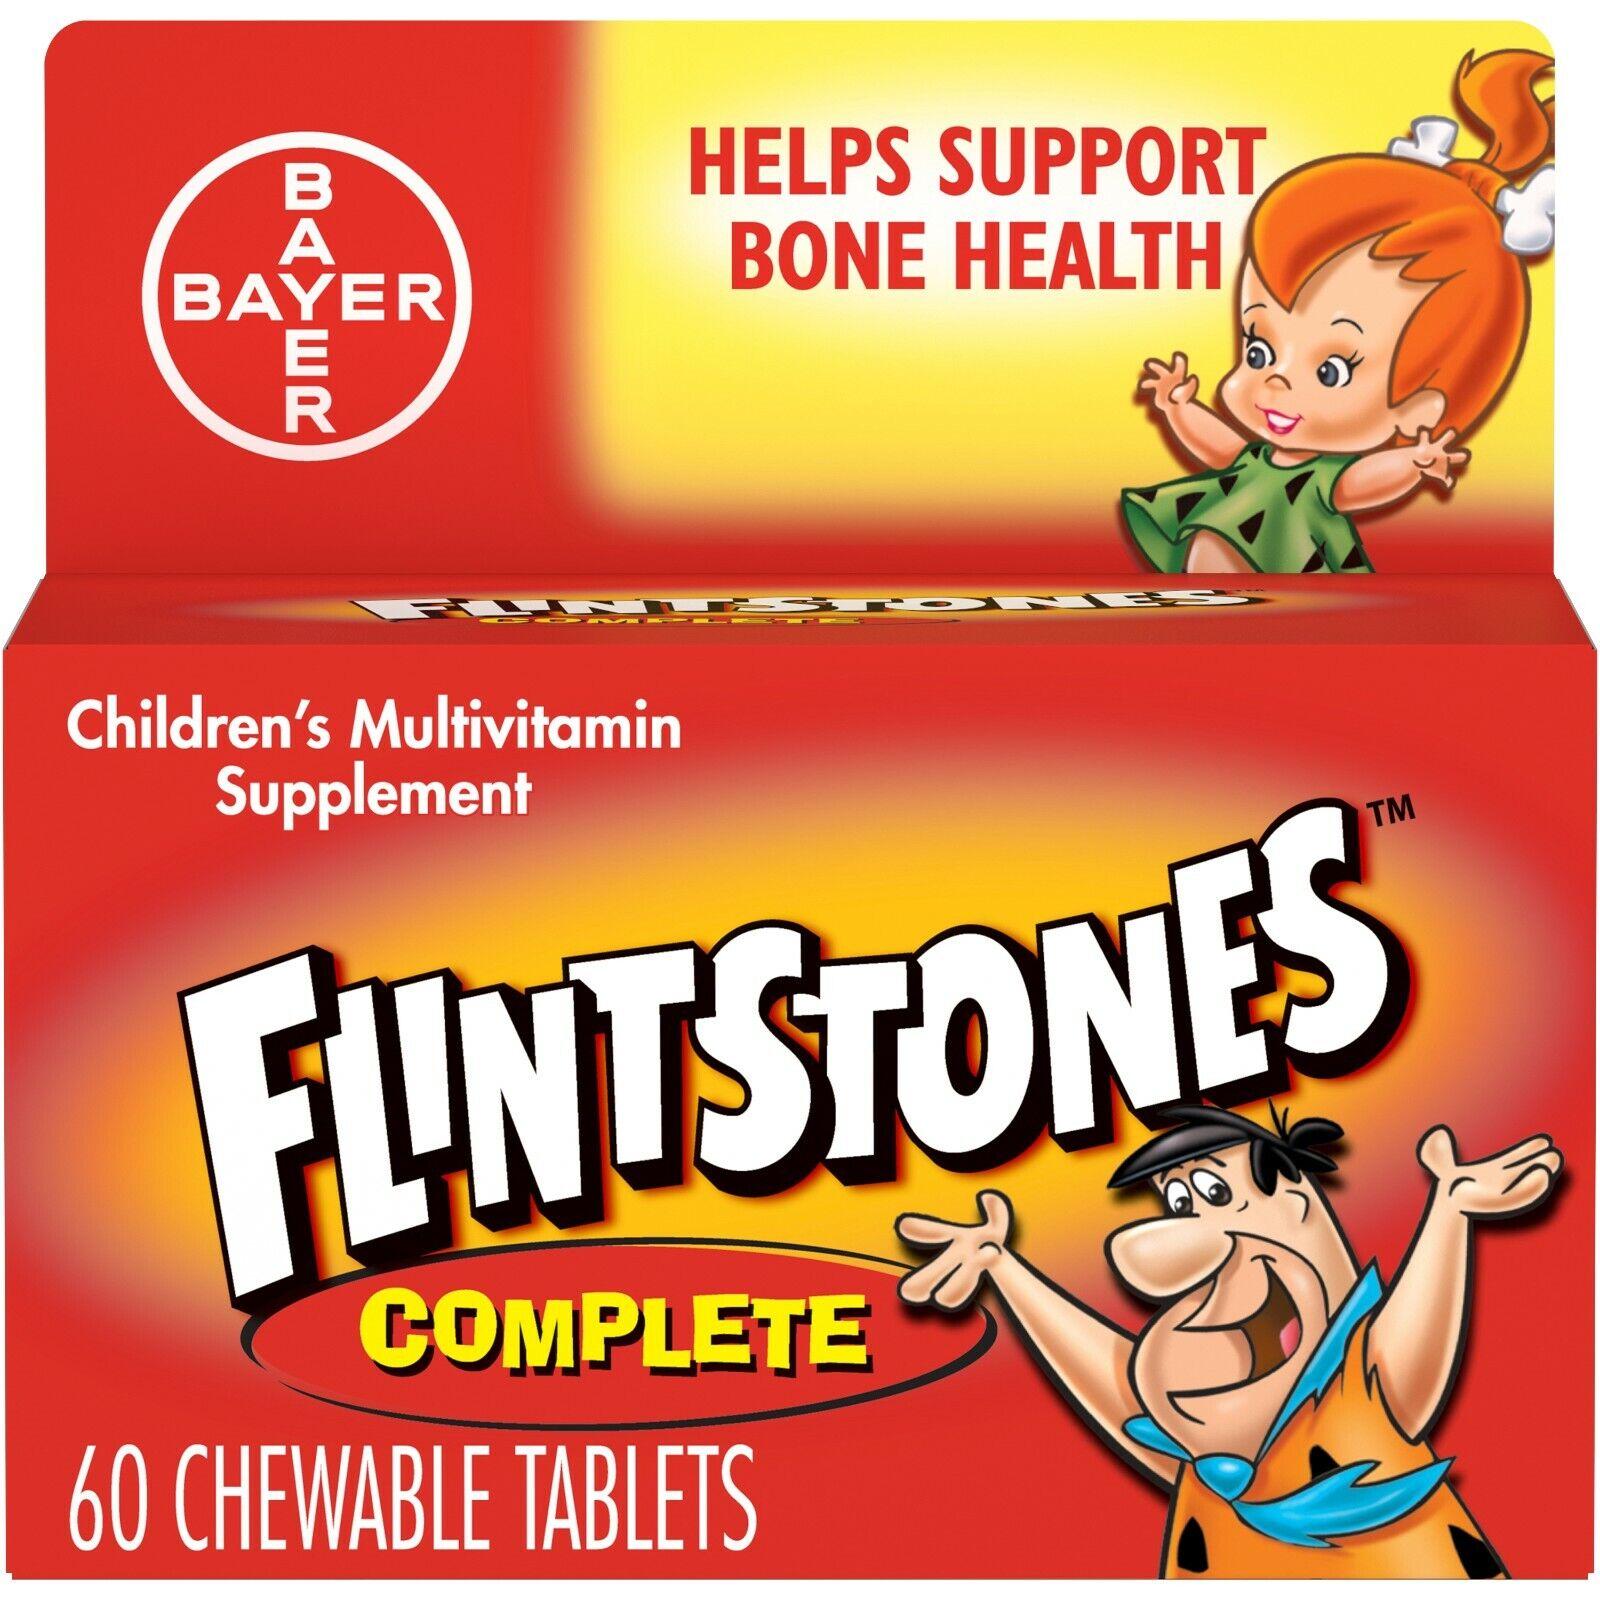 Flintstones Childrens Multivitamin Supplement, 60 tablets